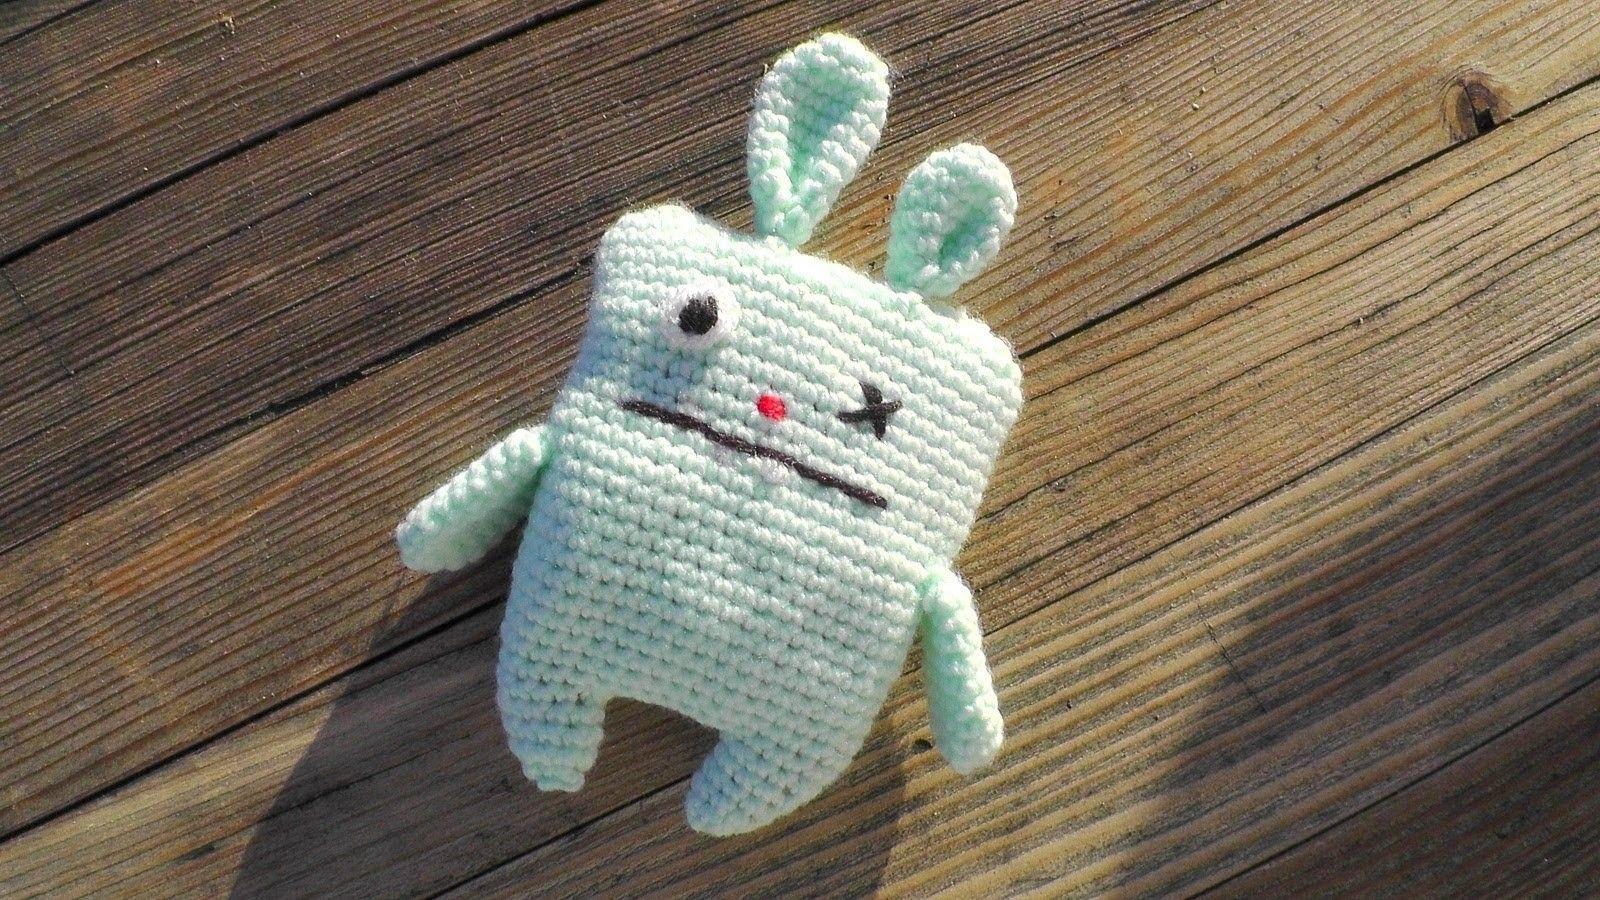 Ugly Bunny Amigurumi Häkelanleitung [Fortgeschrittene] Linkshänder ...